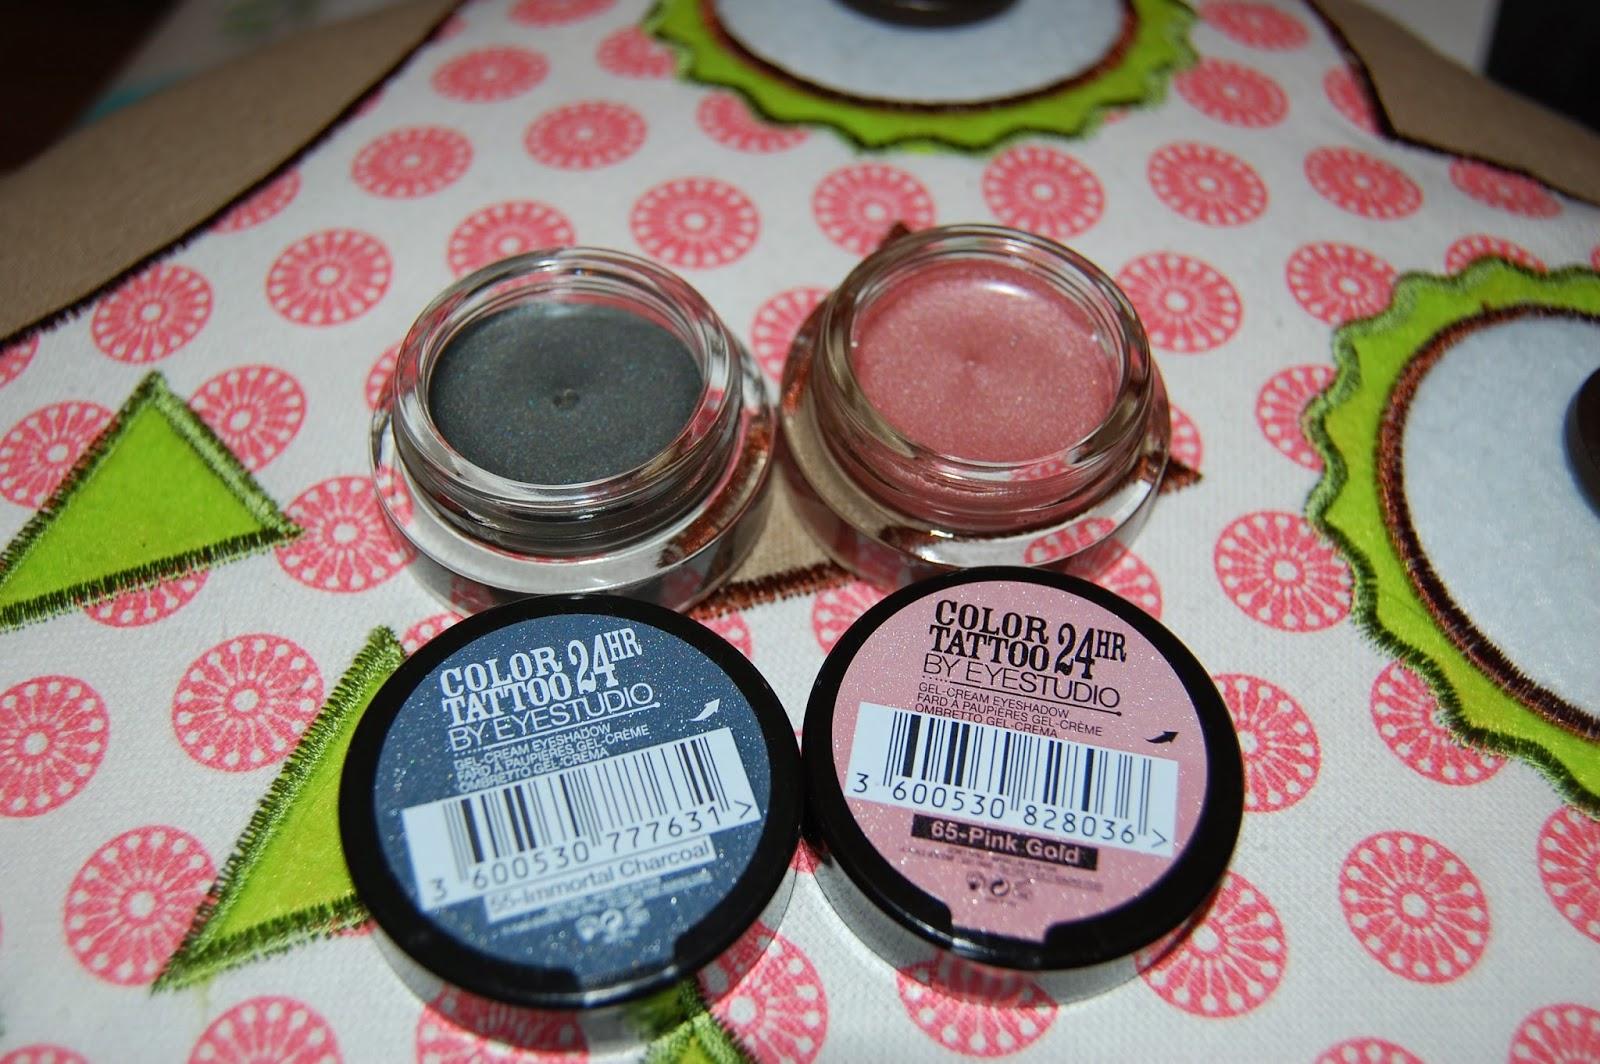 maybelline colour tattoo, eyeshadow, gel eyeshadow, pink, grey, metallics, make up, bbloggers, bblogger, beauty, maybelline